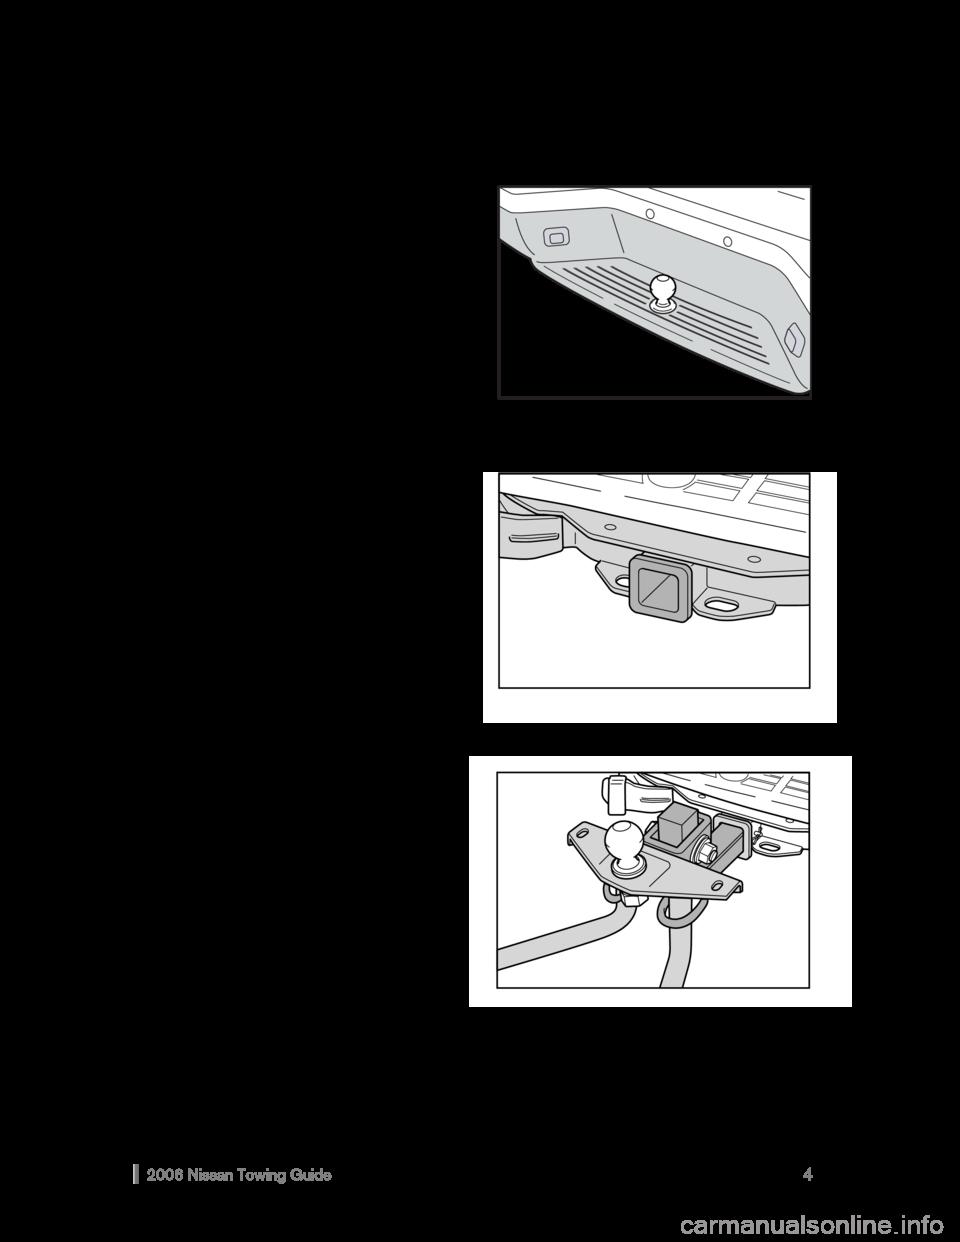 Nissan Sentra 2006 B15 5g Towing Guide Wiring Diagram